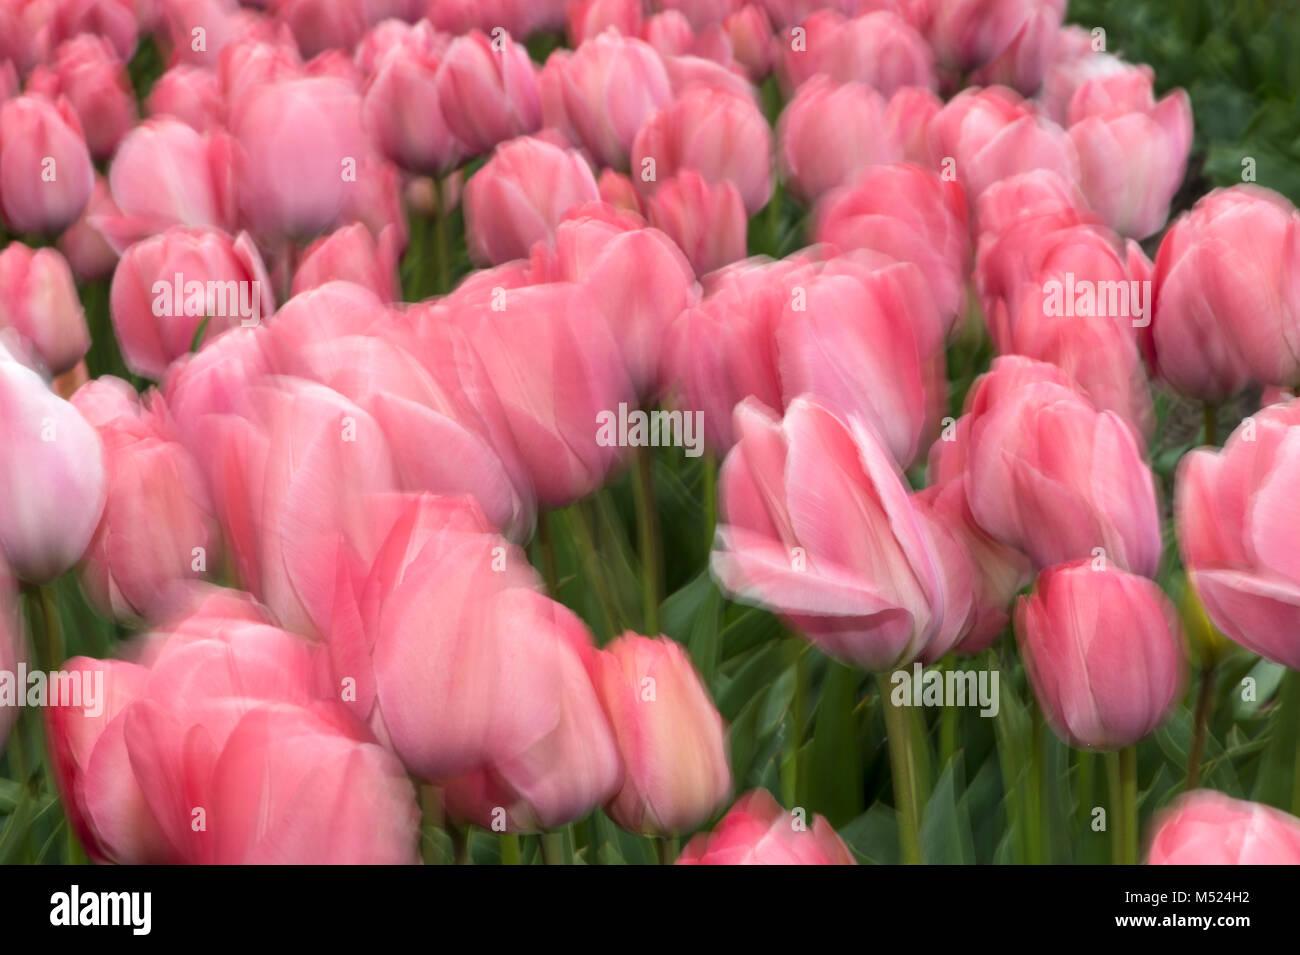 Field with pink tulips in wind,bulb field area Bollenstreek,Noordwijkerhout,The Netherlands - Stock Image